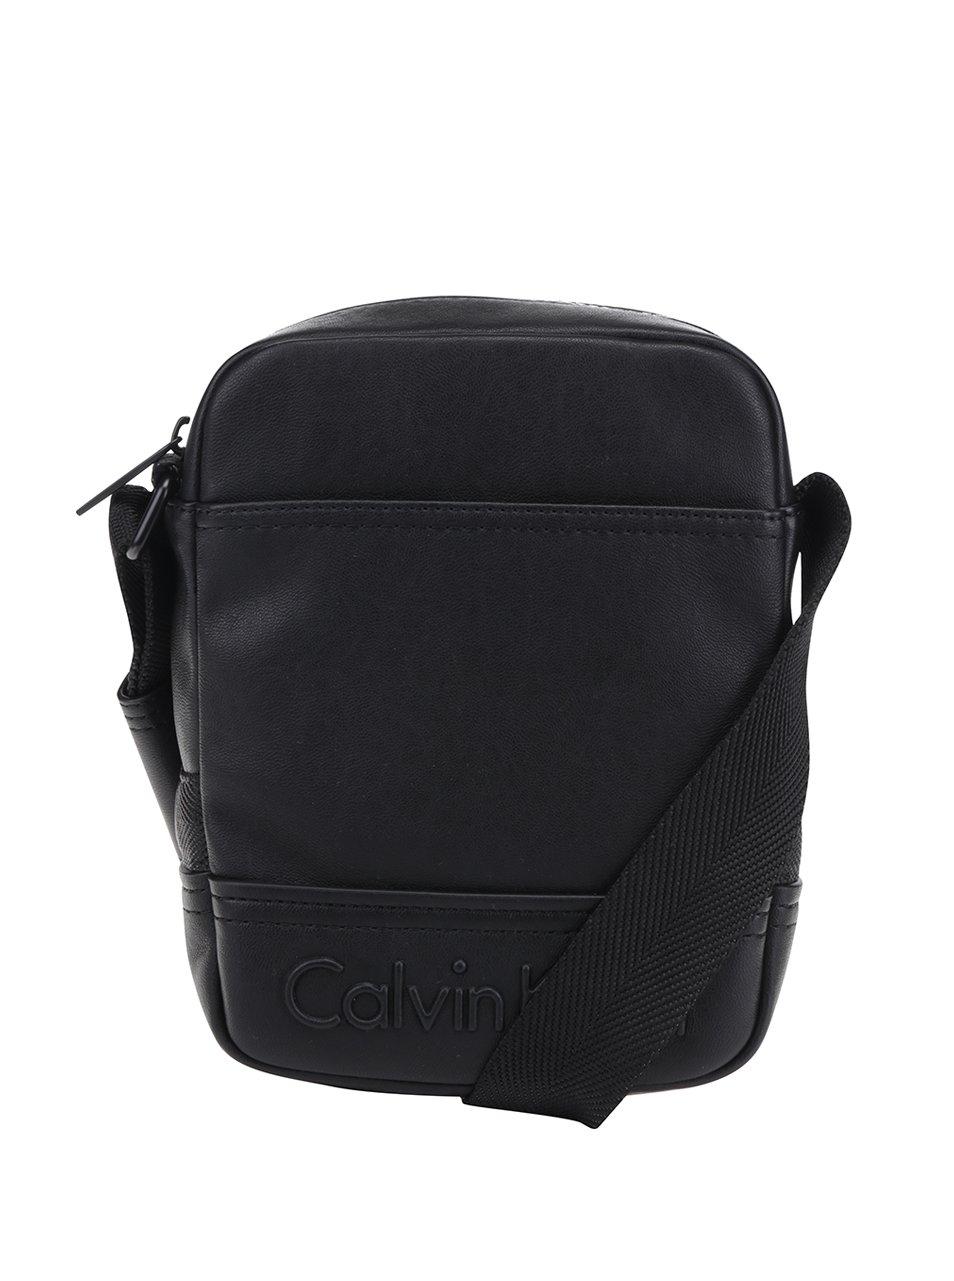 Černá pánská crossbody taška s logem Calvin Klein Jeans Bastian